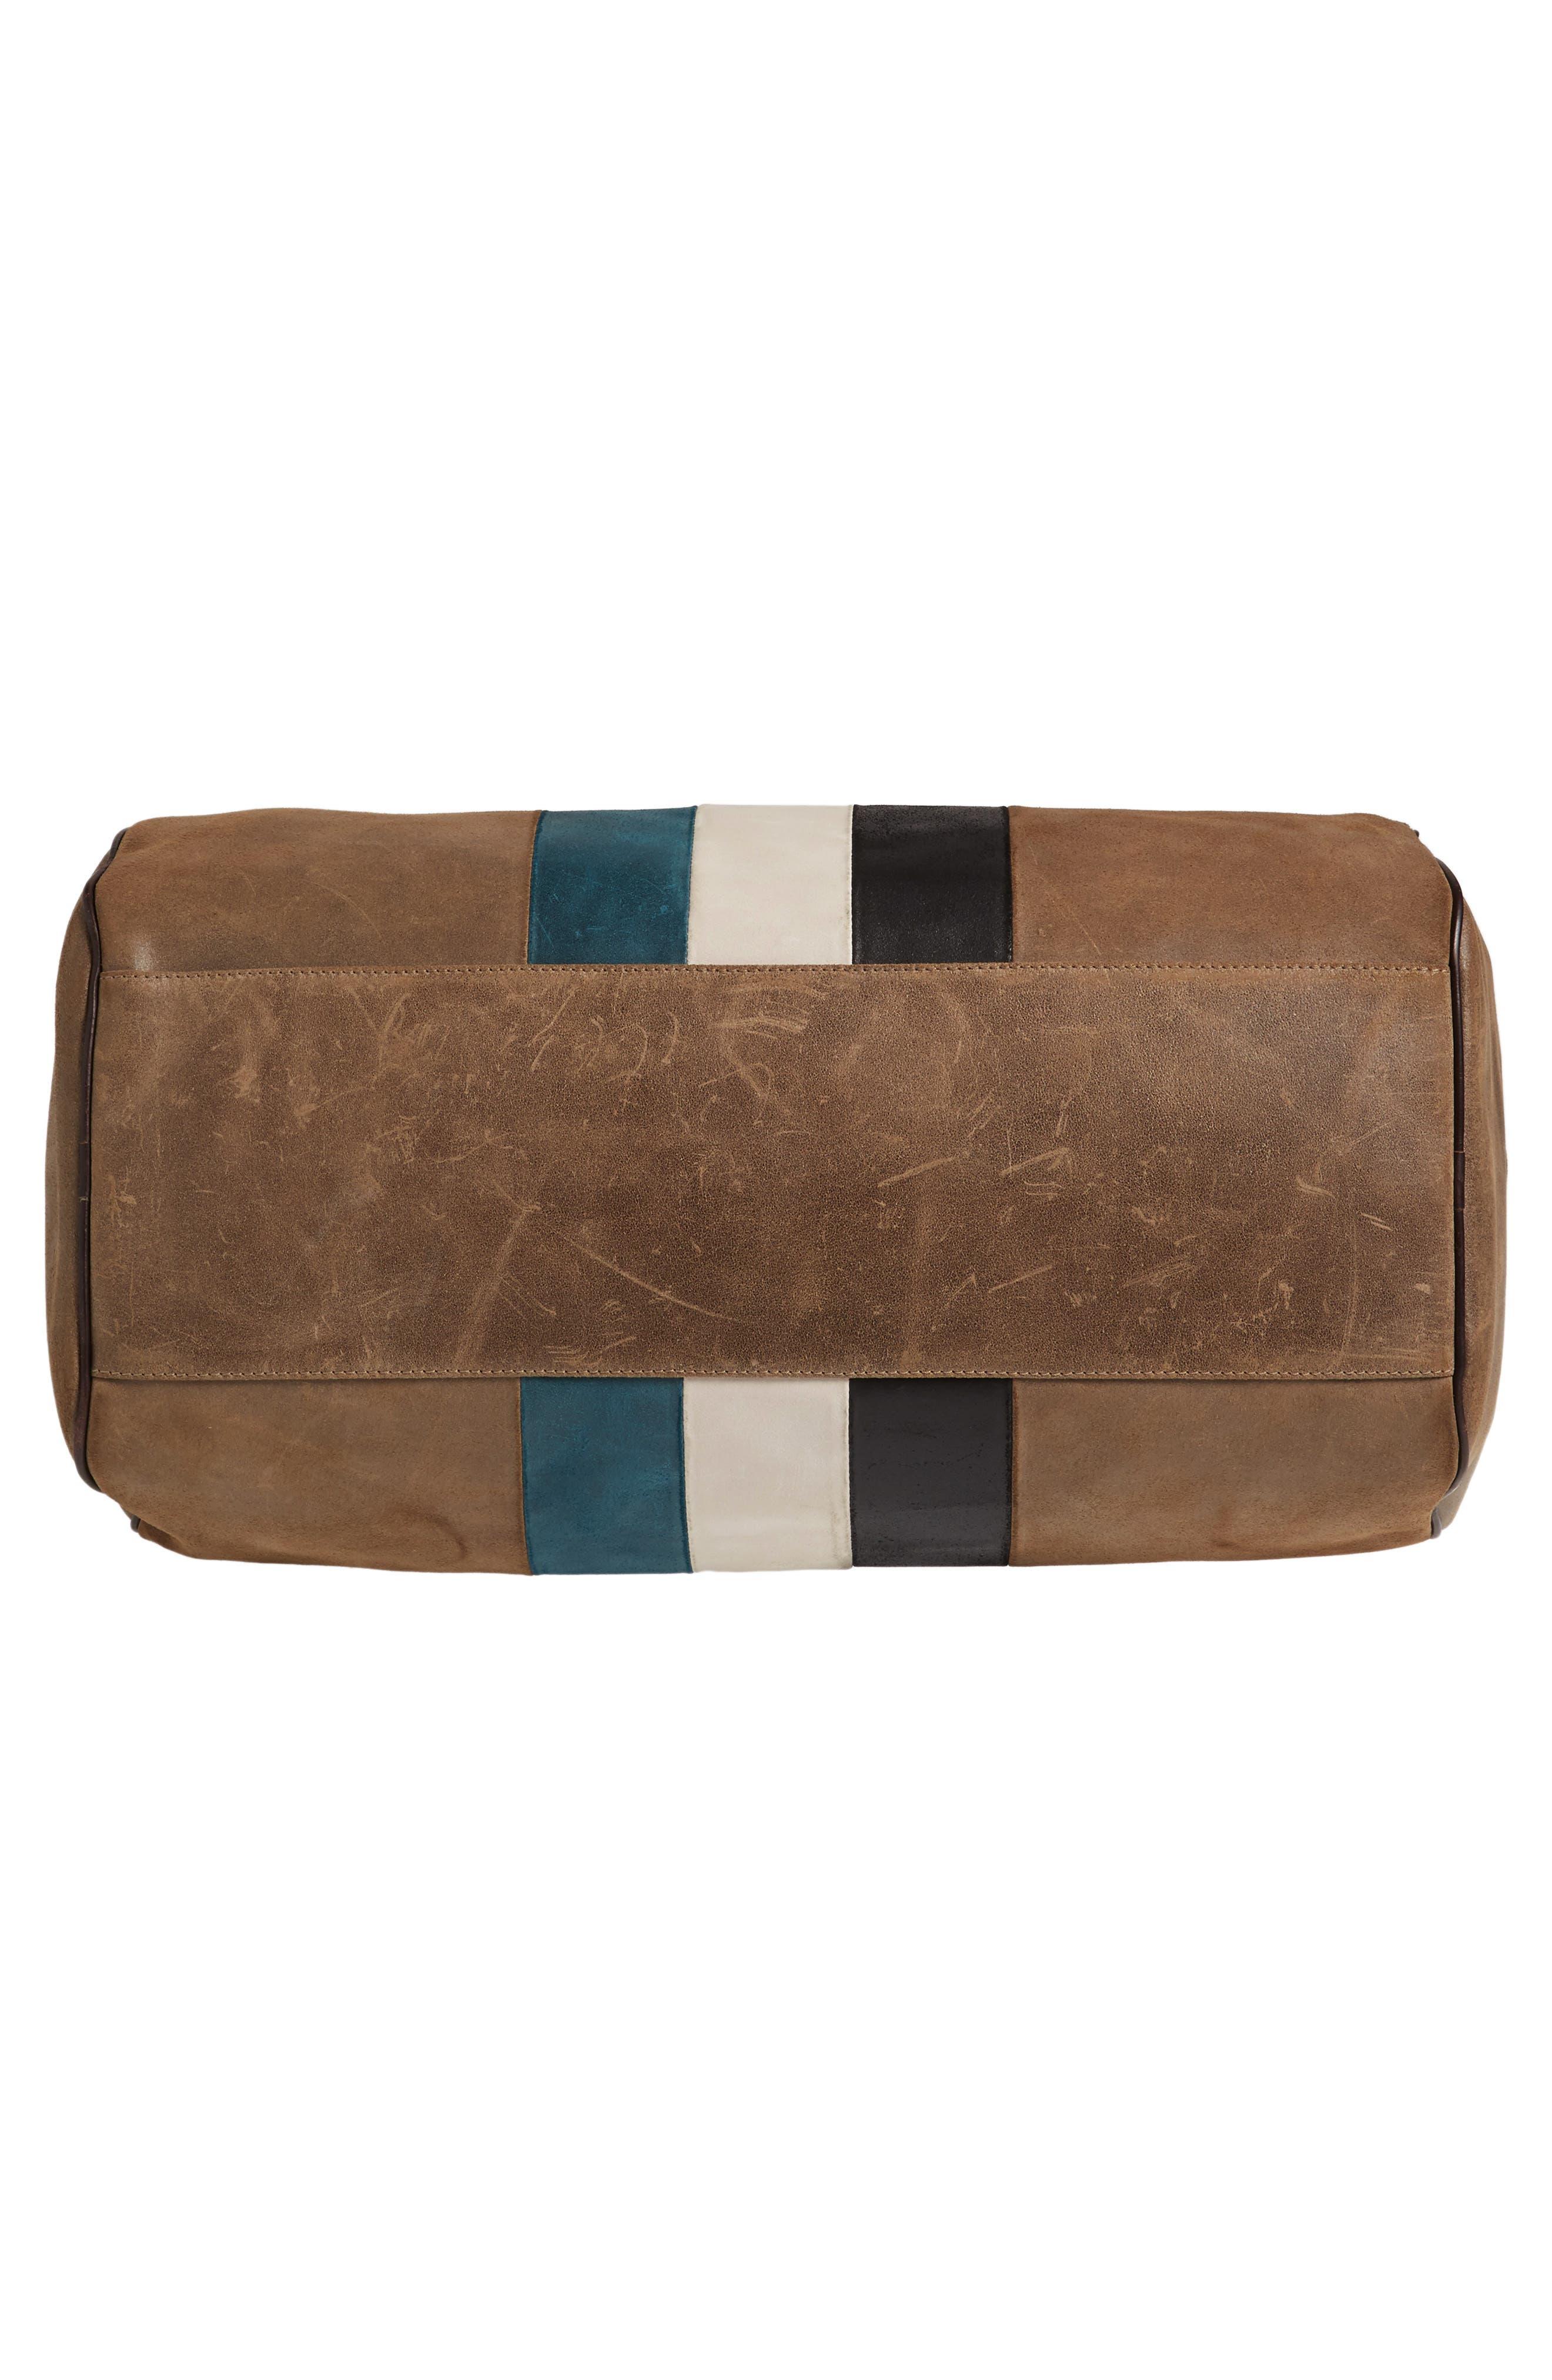 Grove Stripe Leather Duffel Bag,                             Alternate thumbnail 5, color,                             250